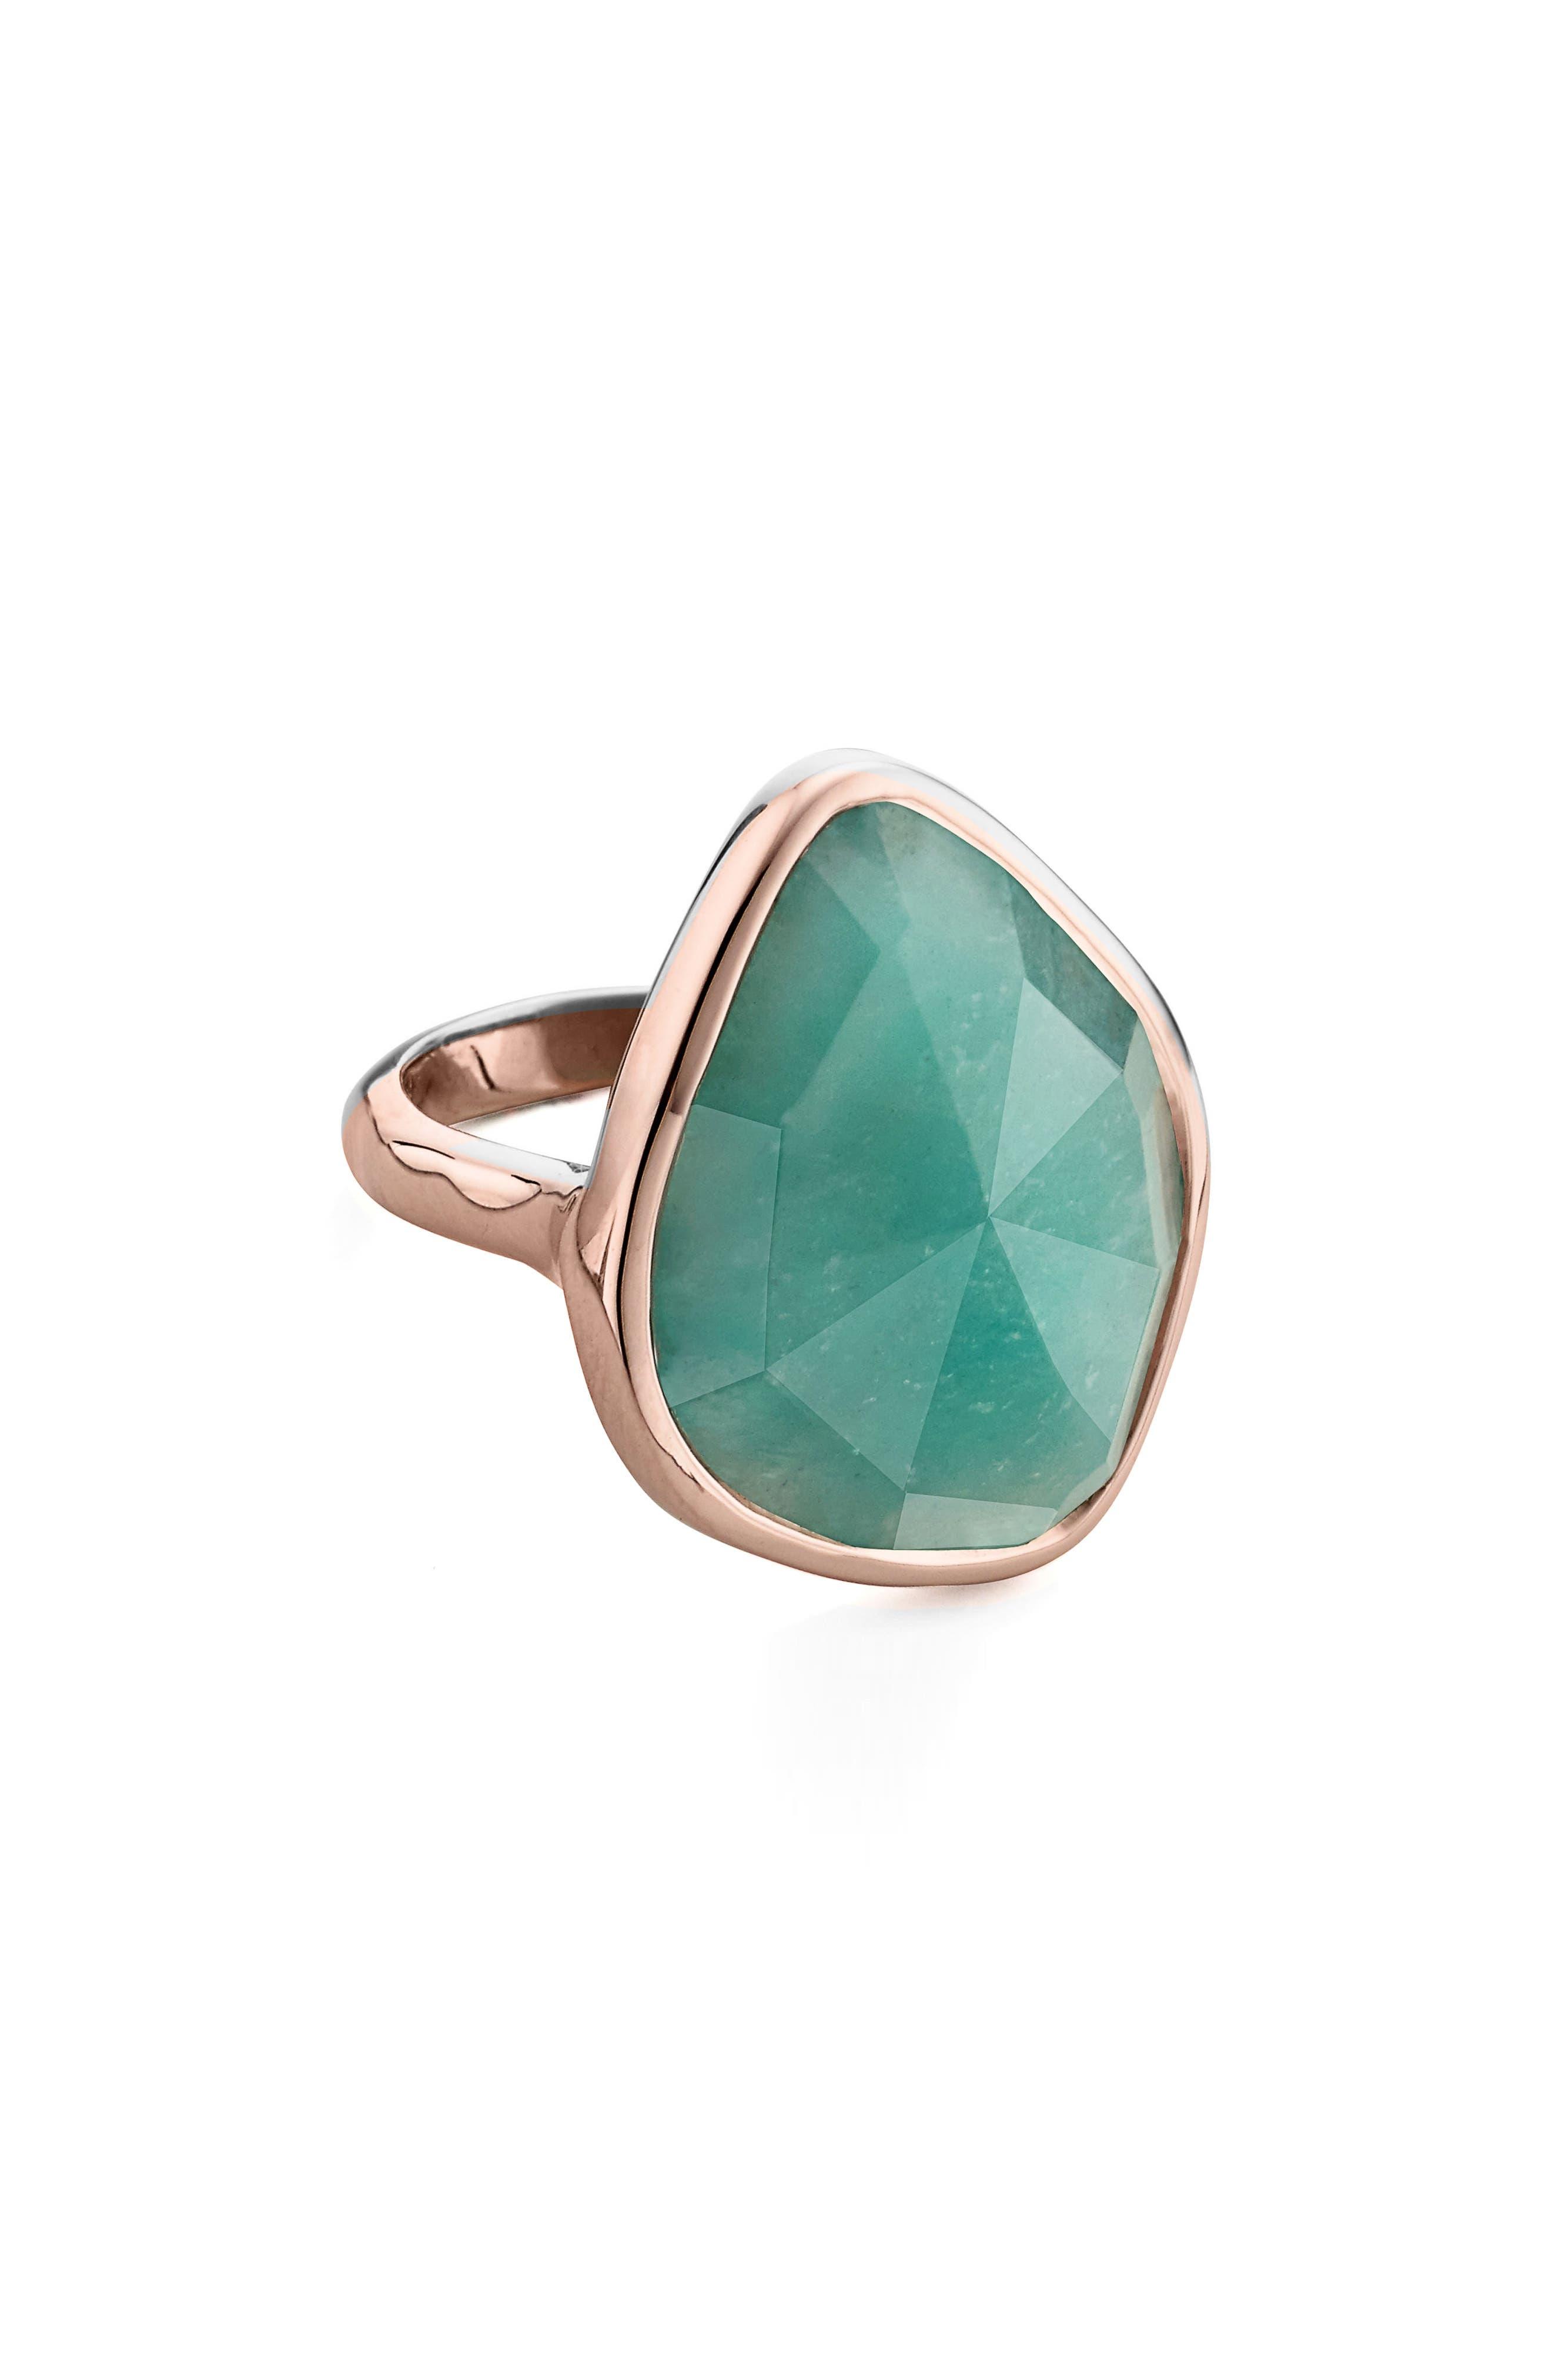 Siren Nugget Semiprecious Stone Cocktail Ring,                         Main,                         color, Rose Gold/ Amazonite